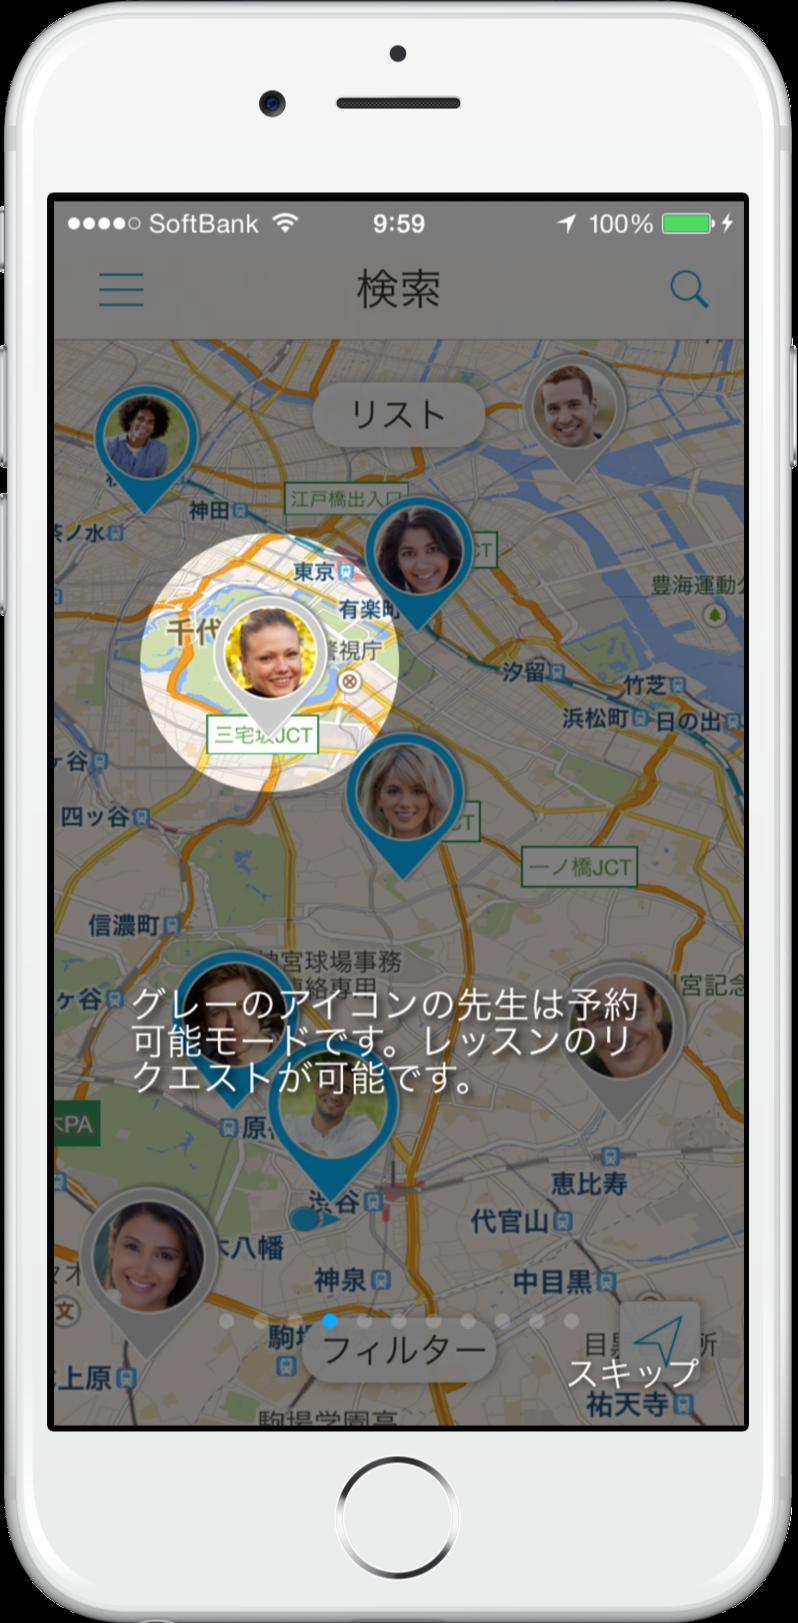 eikaiwaNOW - レッスンの流れ - JPN - 3_iphone6_silver_portrait.png